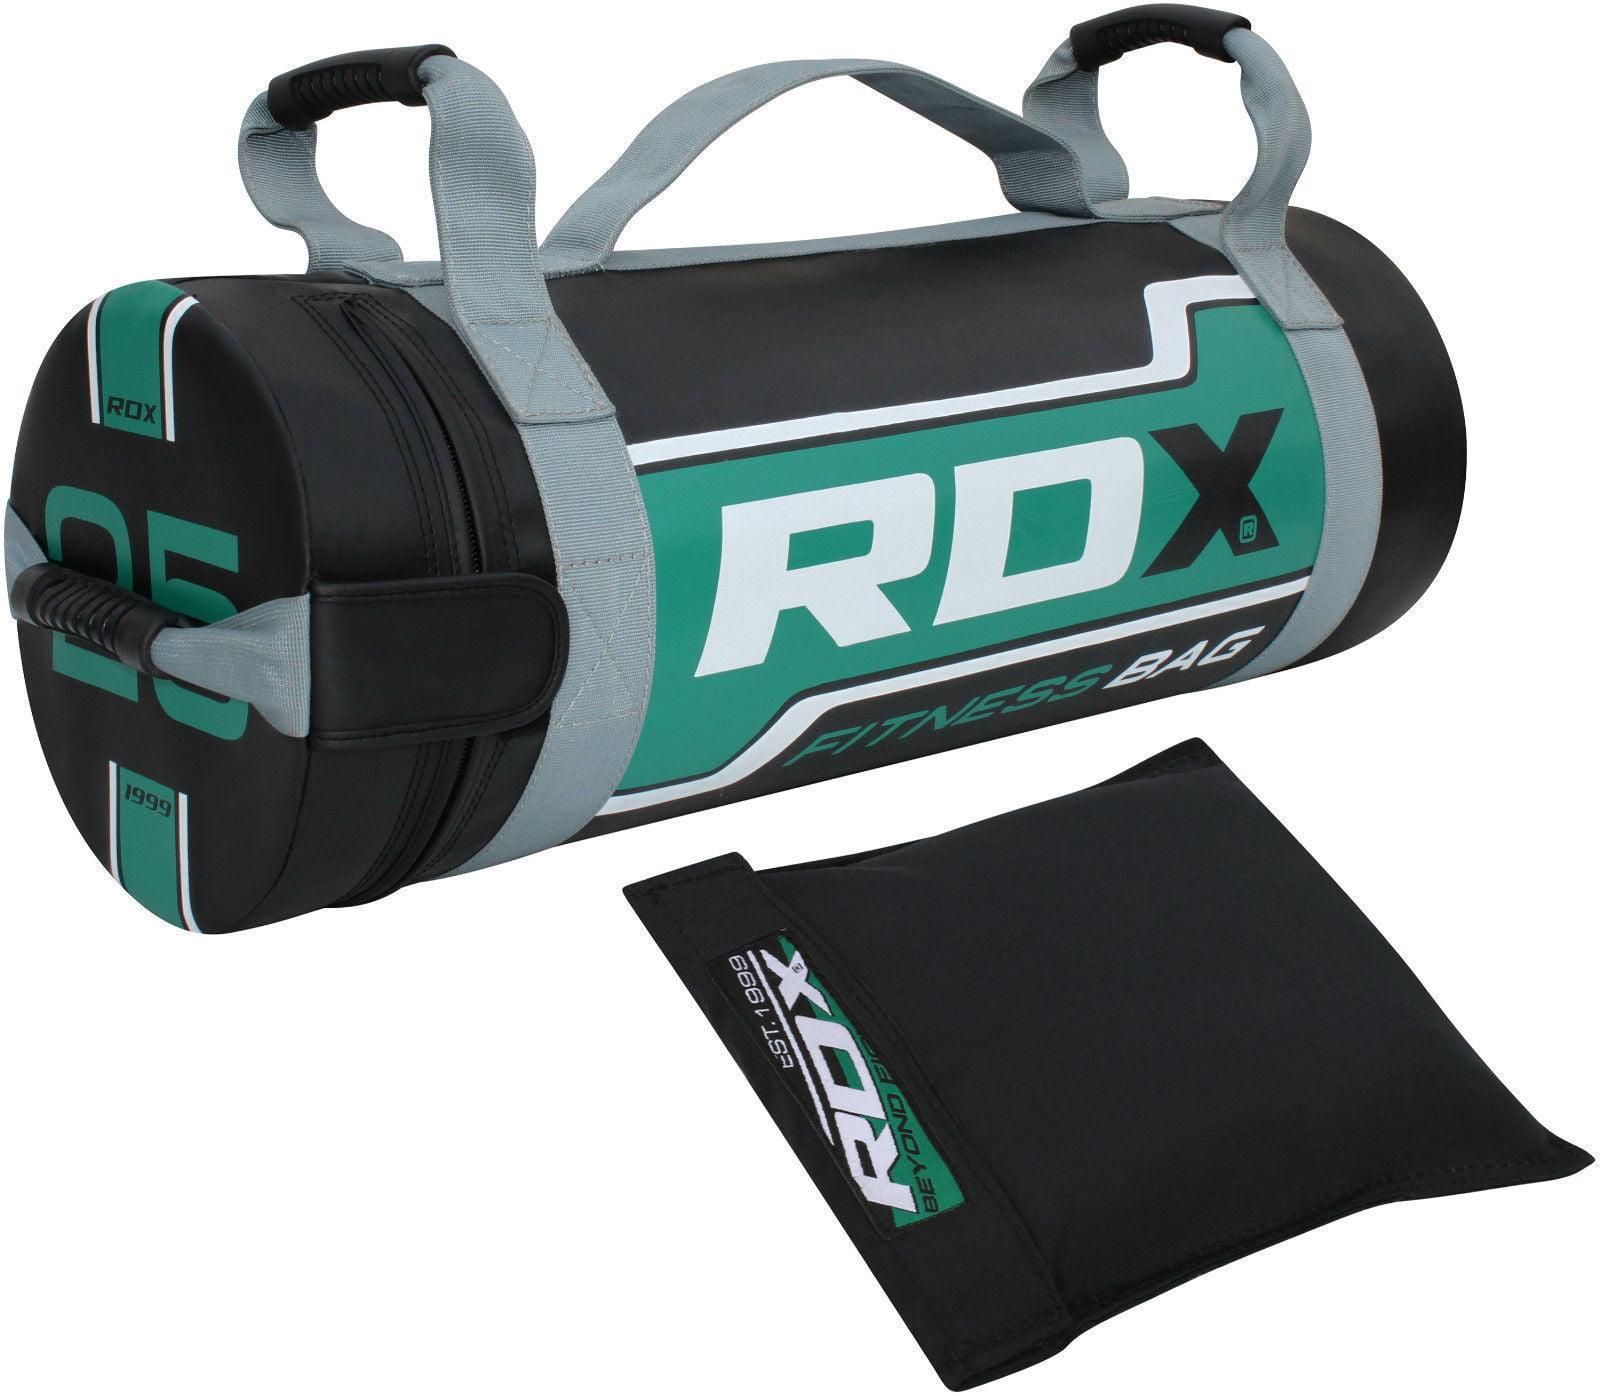 Gym Bag Walmart: RDX Sandbag Workout Fitness Weighted Gym Sports Weight Bag